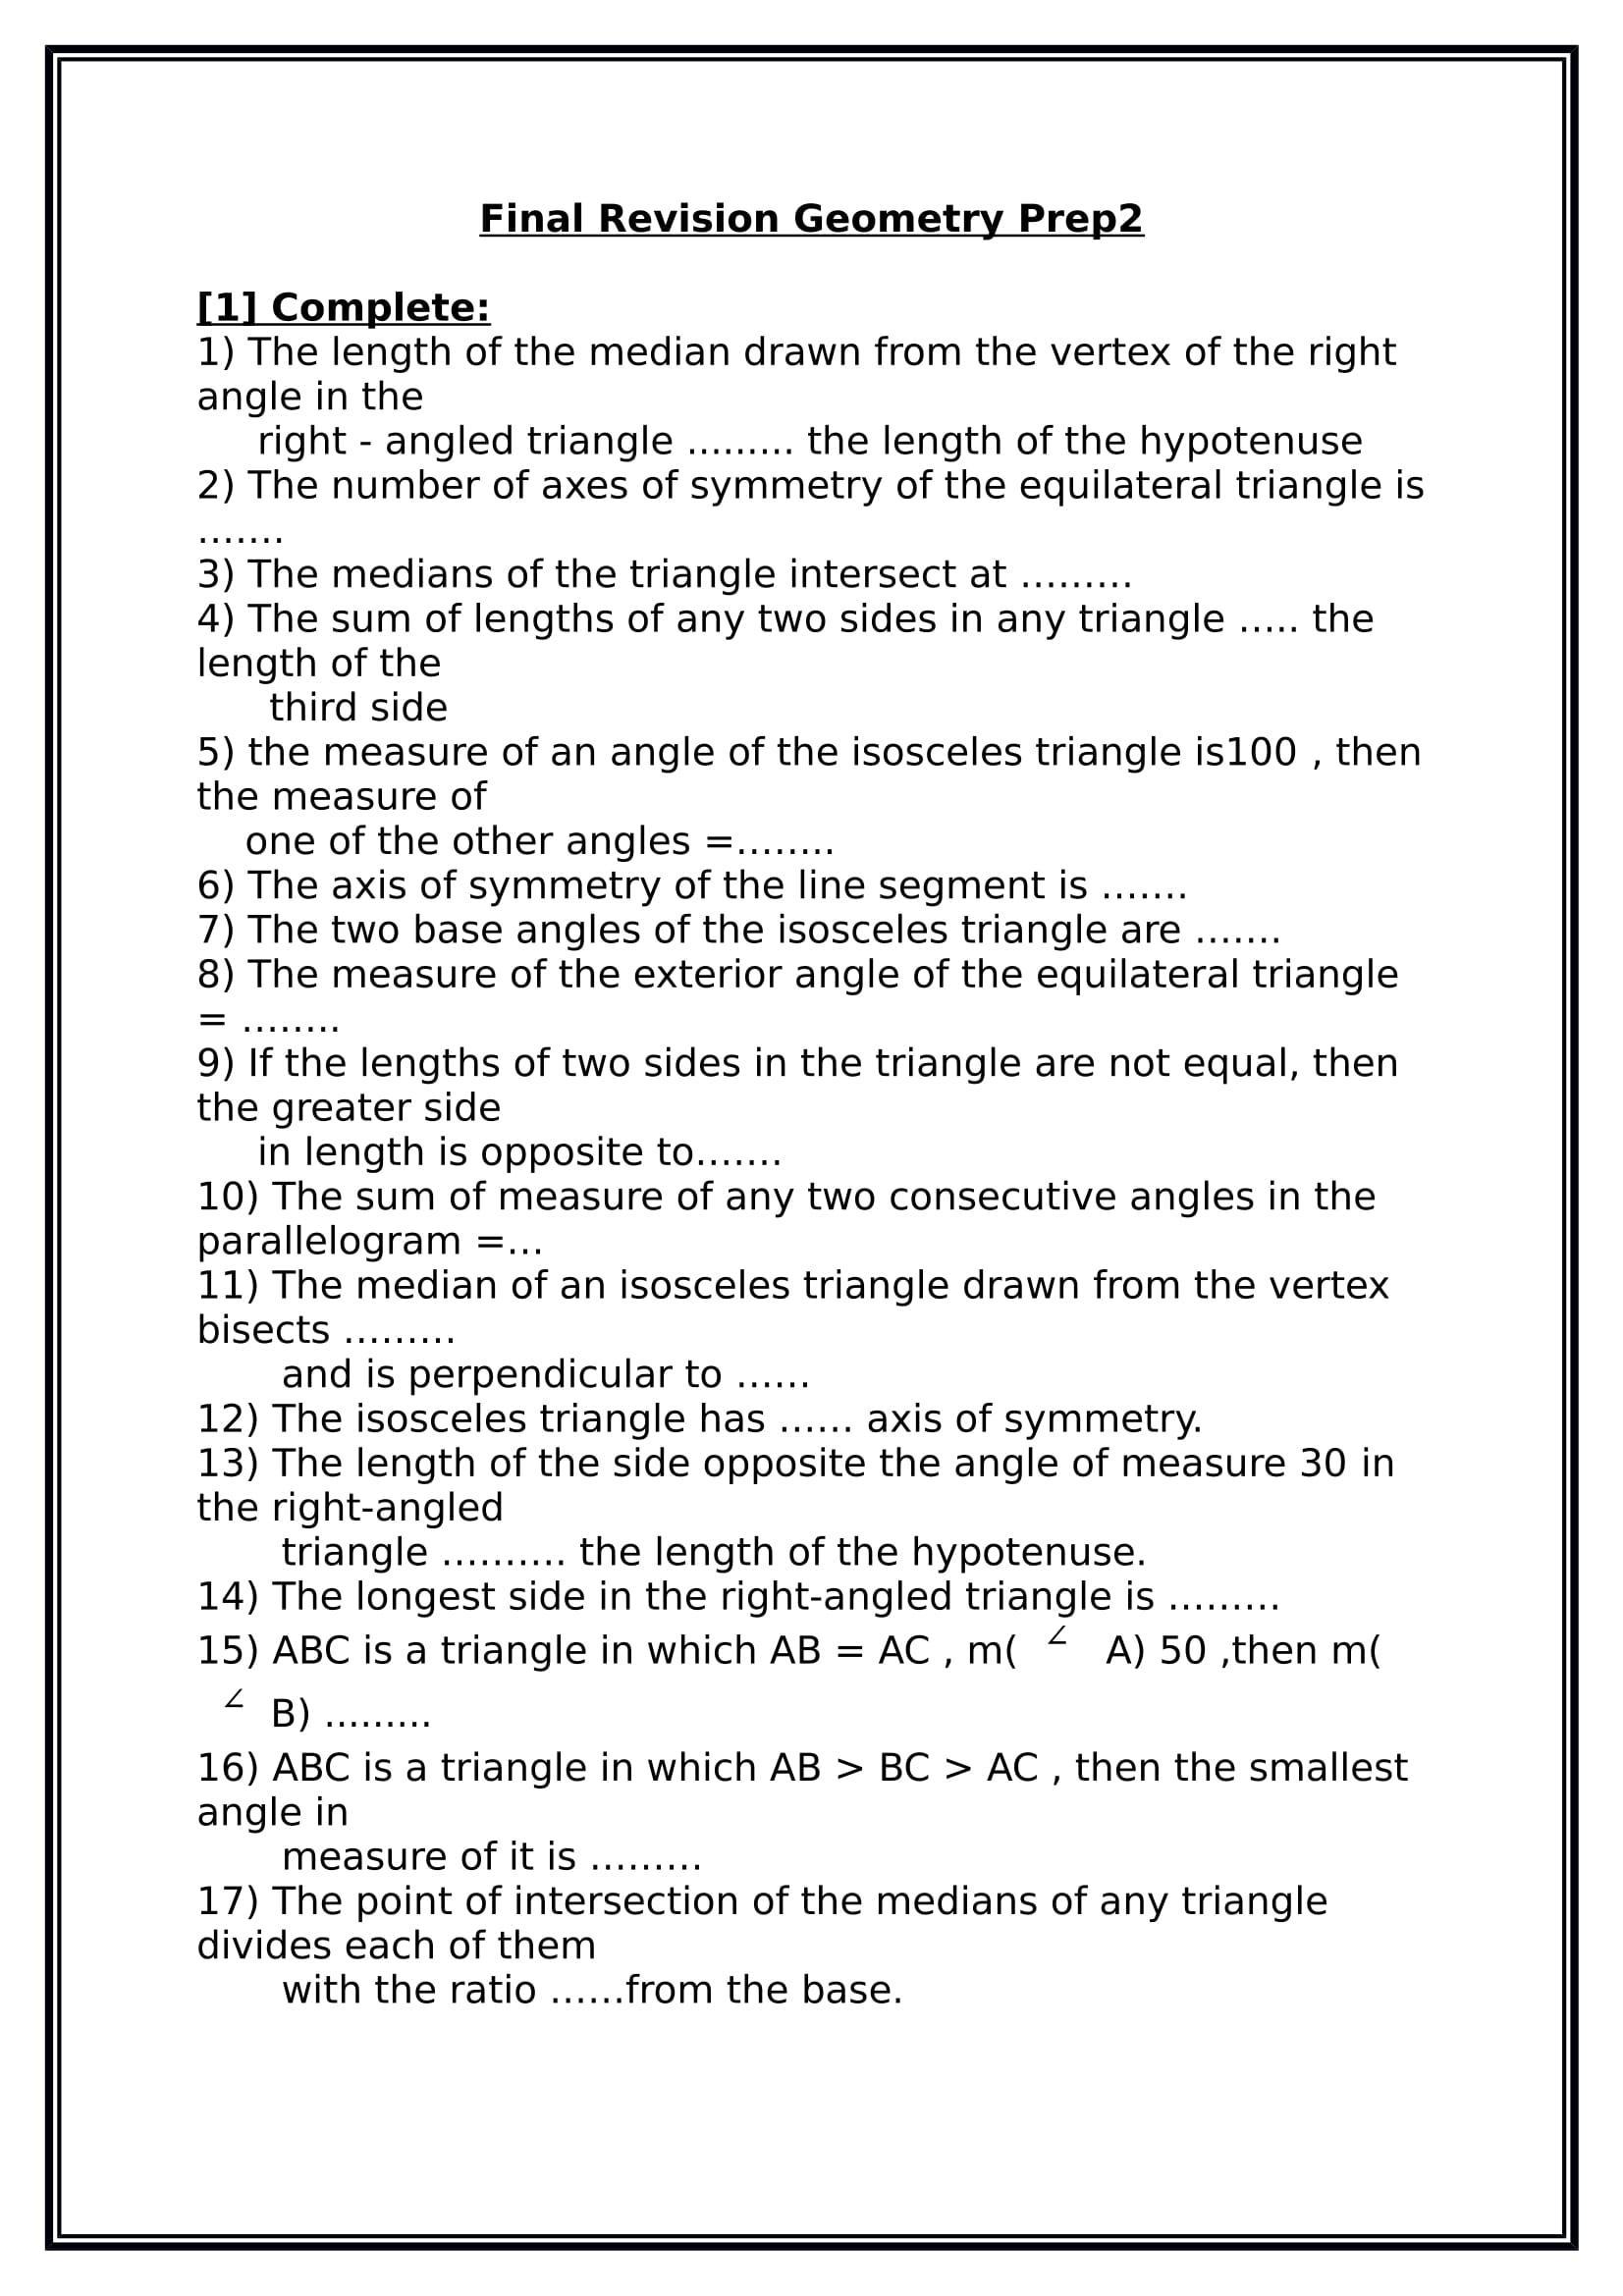 exam-eg.com_1510660444031.jpg